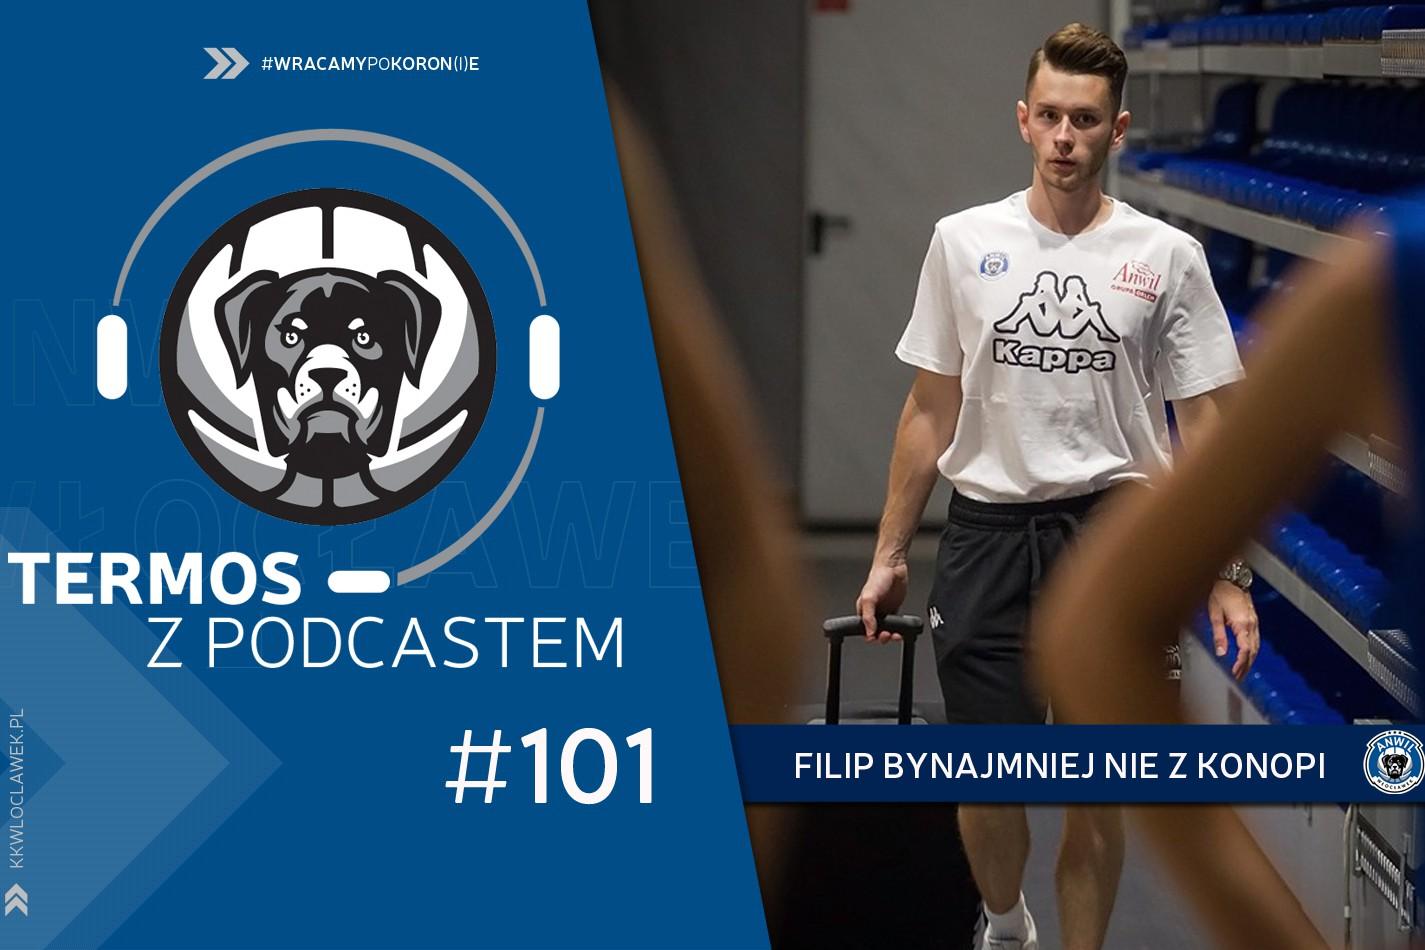 Termos z Podcastem #101: Filip bynajmniej nie z konopi